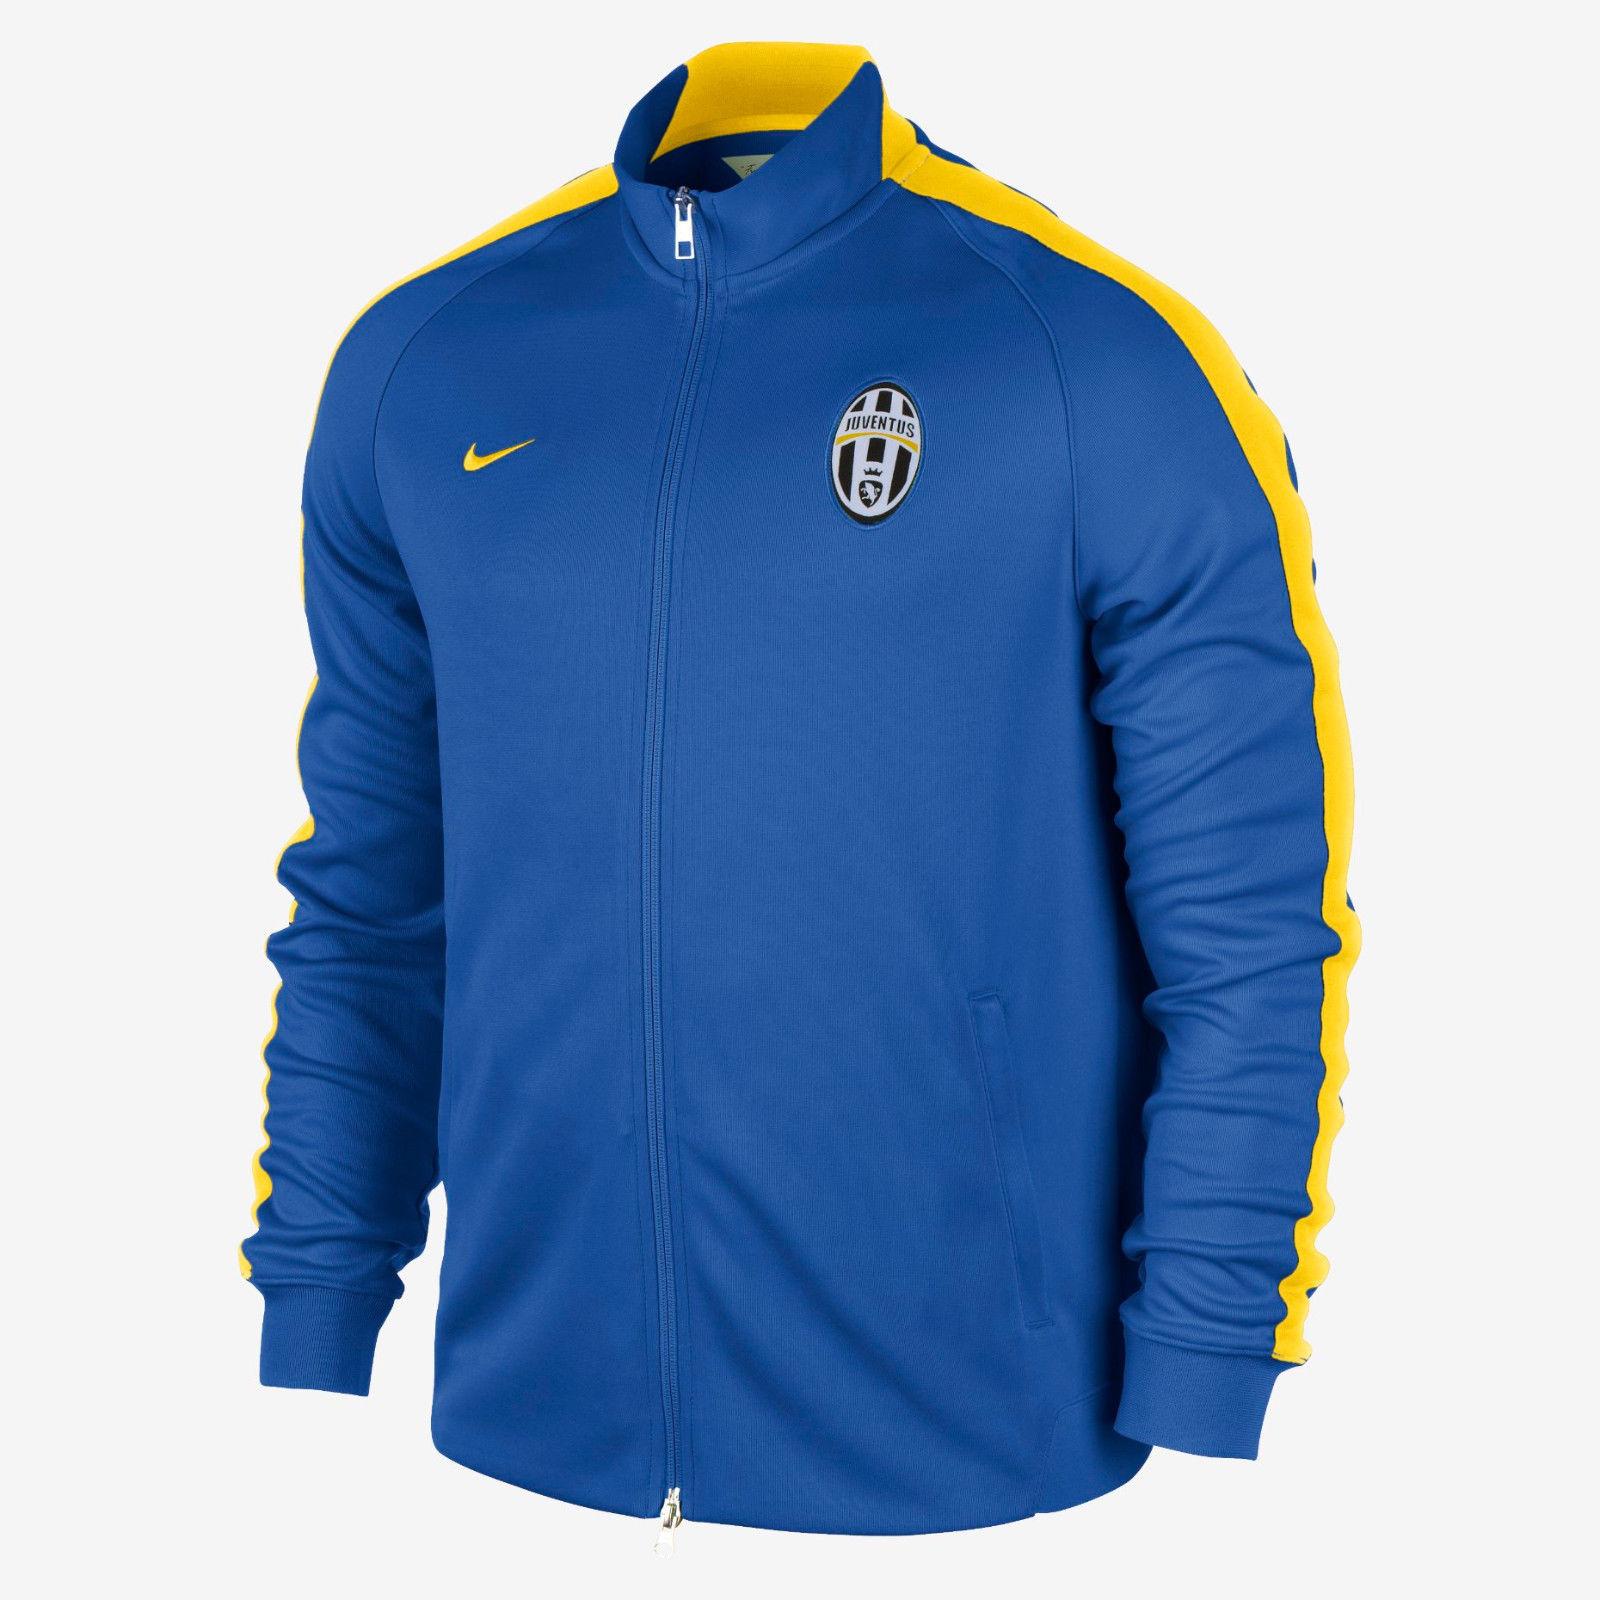 cdc3954c4a Giacca Tuta Nike FC JUVENTUS Authentic N98 TrackTop